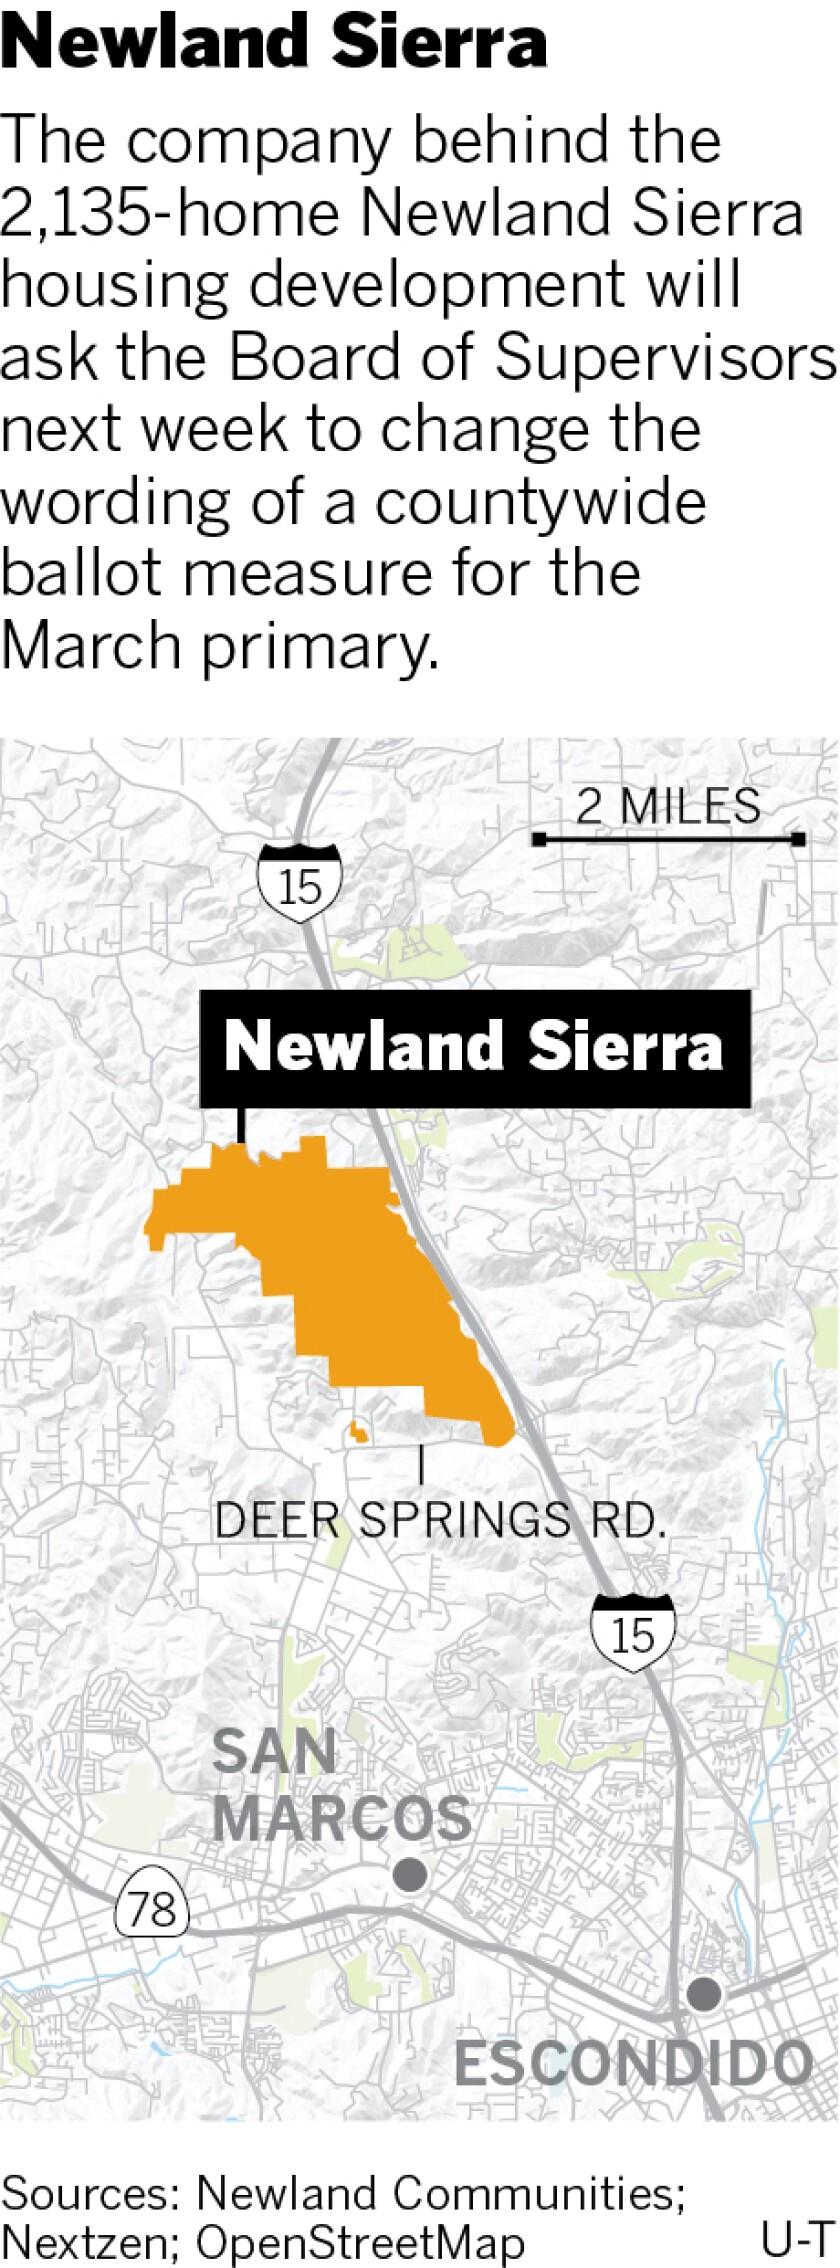 472824-w2-sd-g-no-newland-sierra-wording.jpg